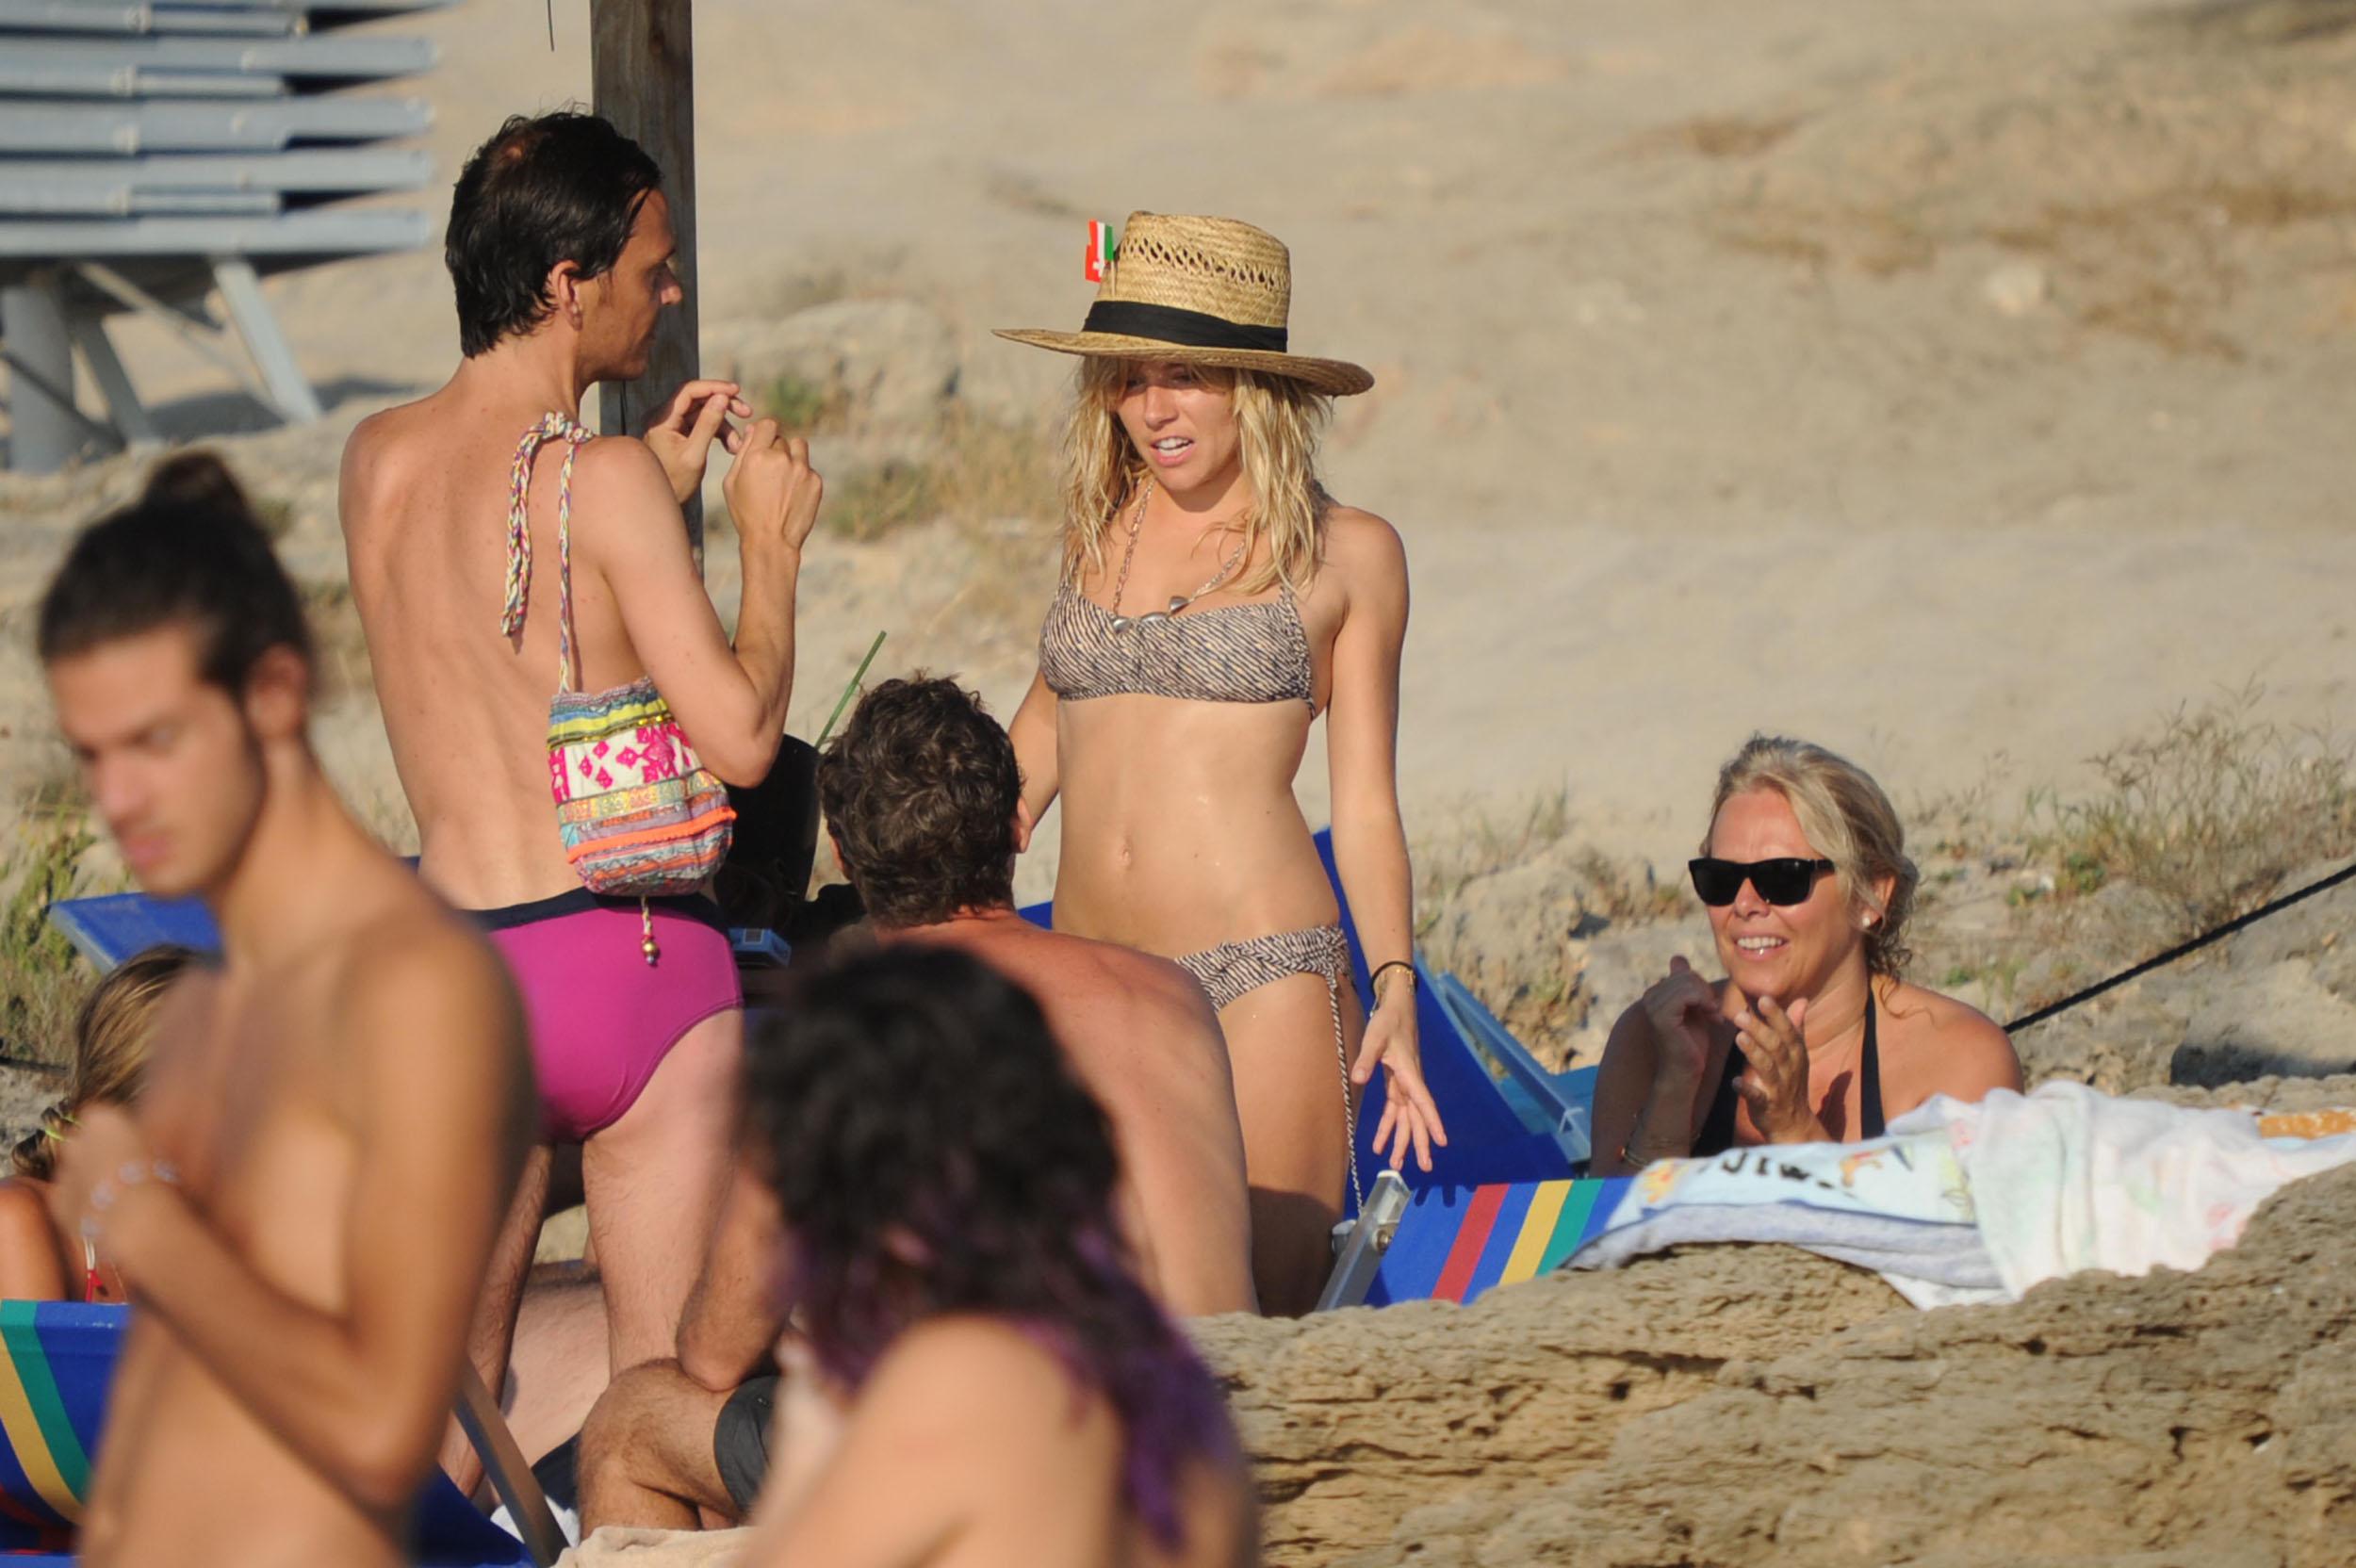 87982_Sienna_Miller_Bikini_Italy_5_122_87lo.jpg